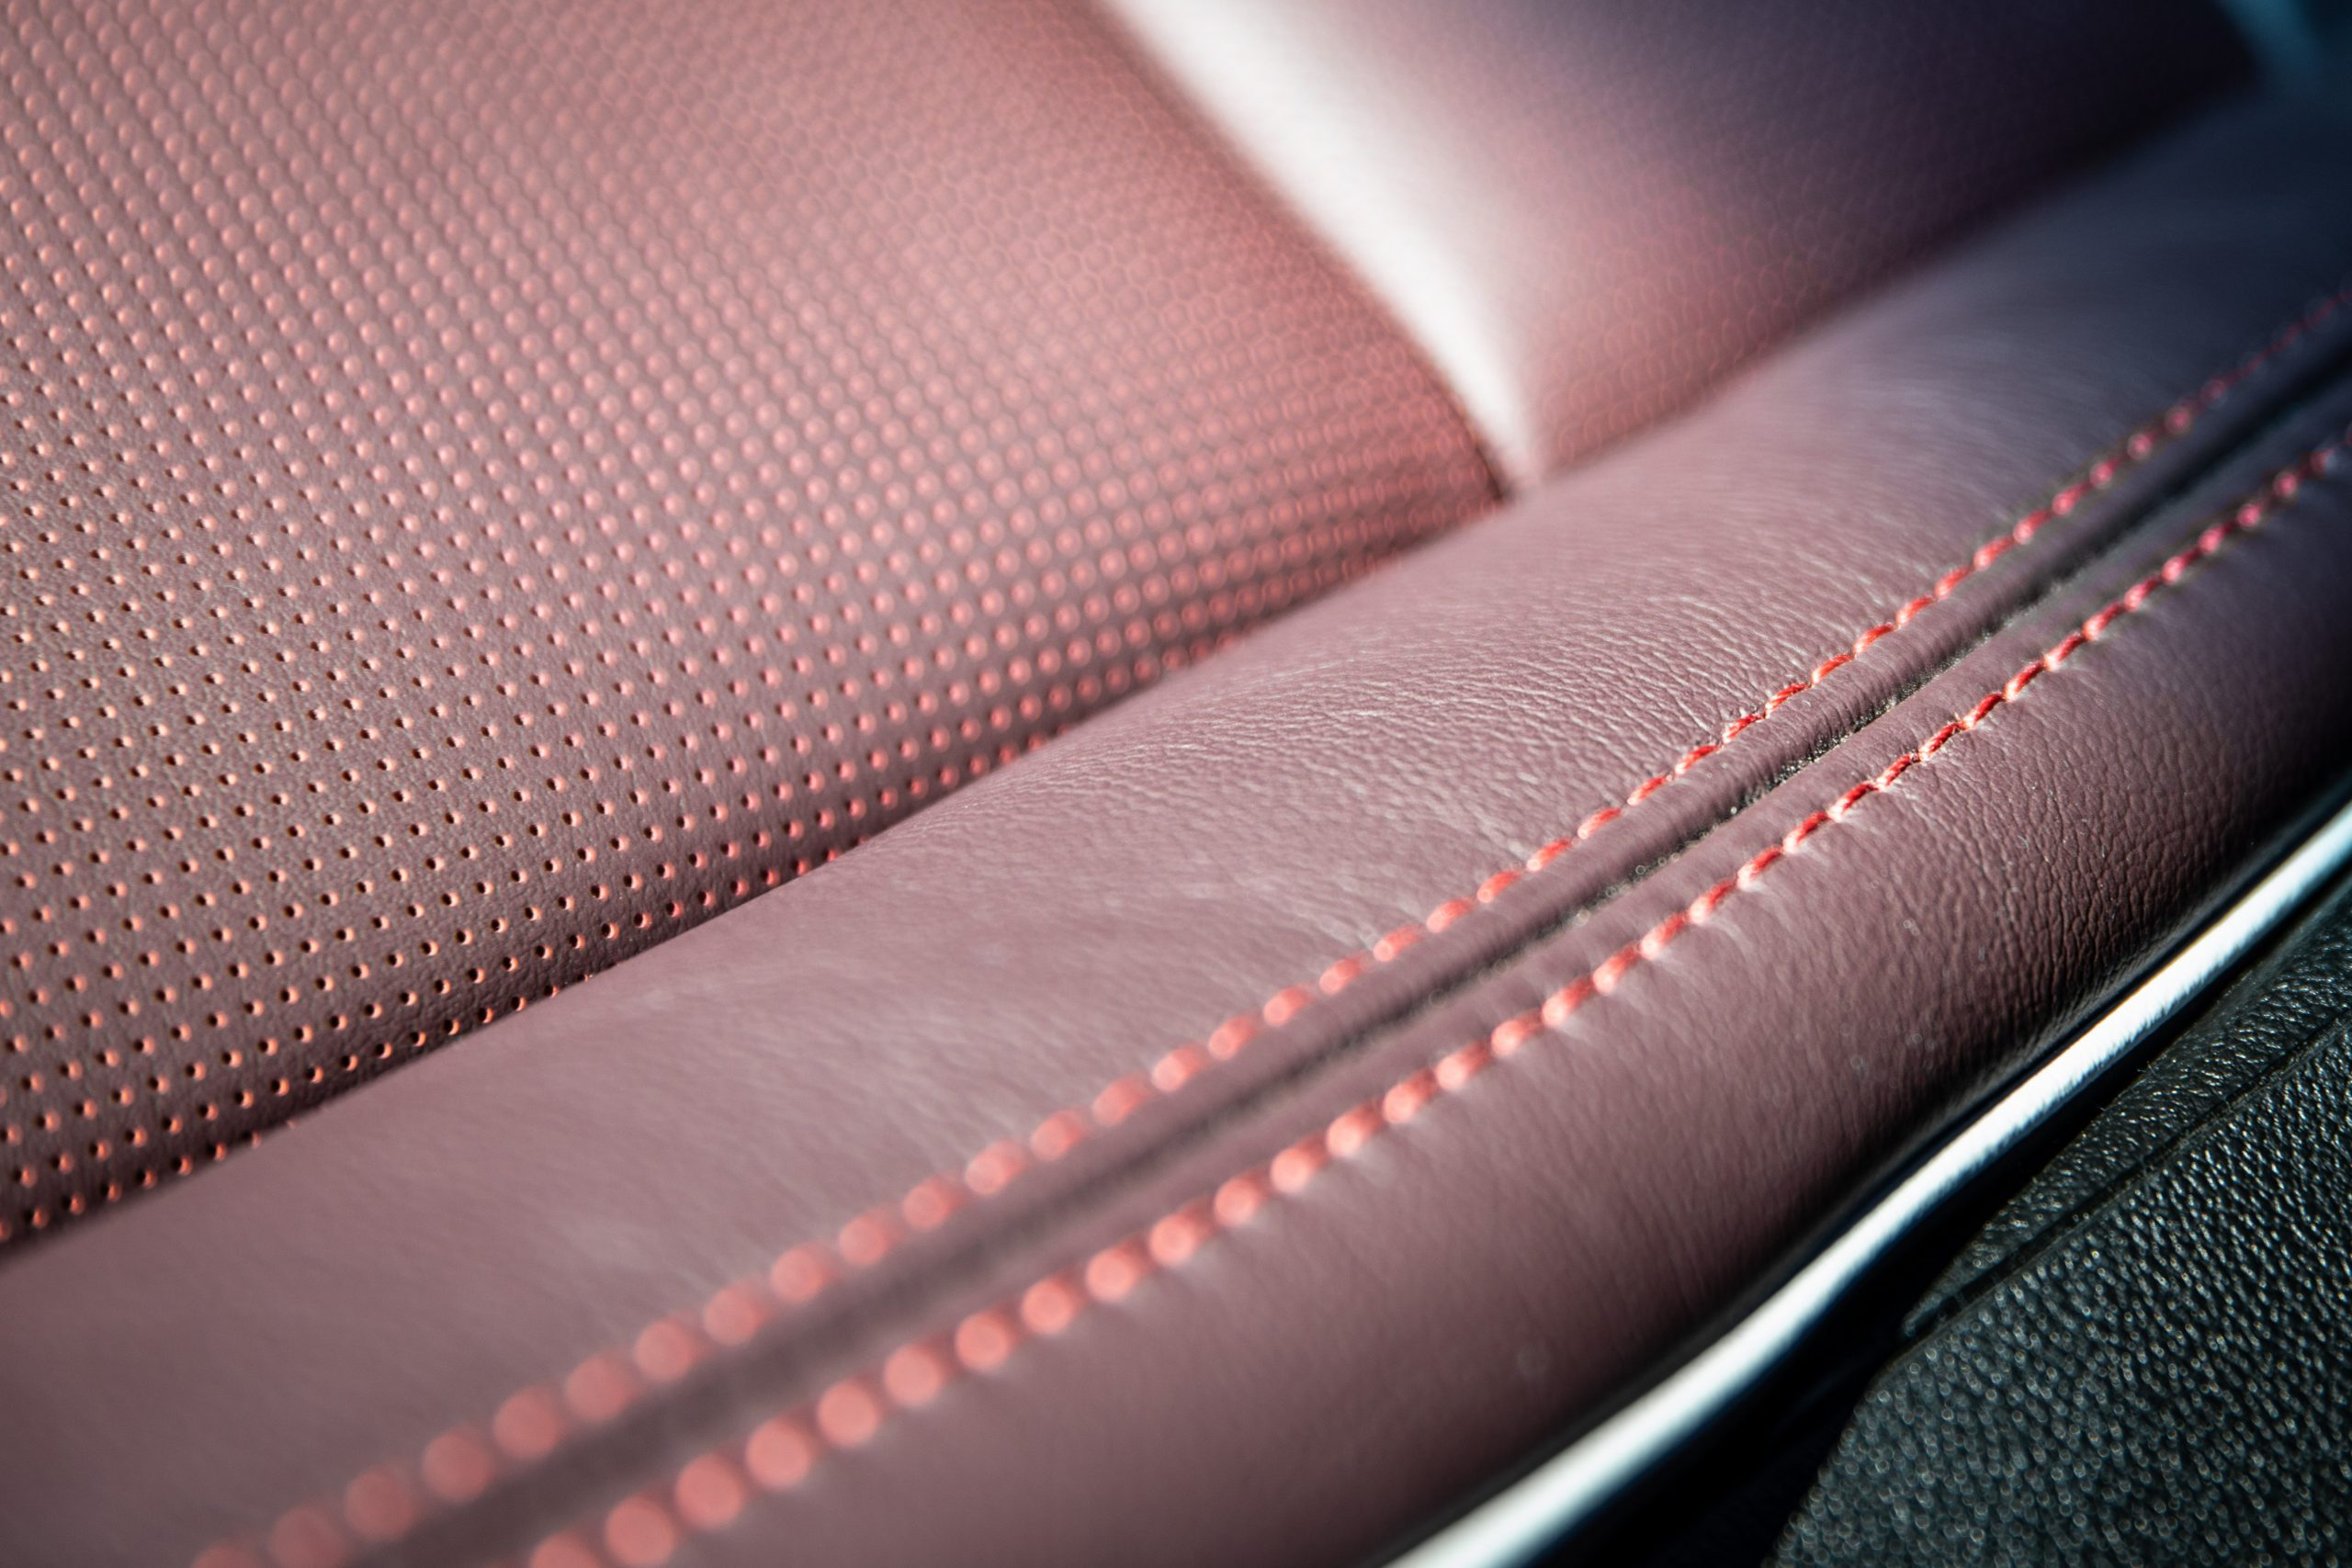 2020 Cadillac CT4-V 24 seat stitching